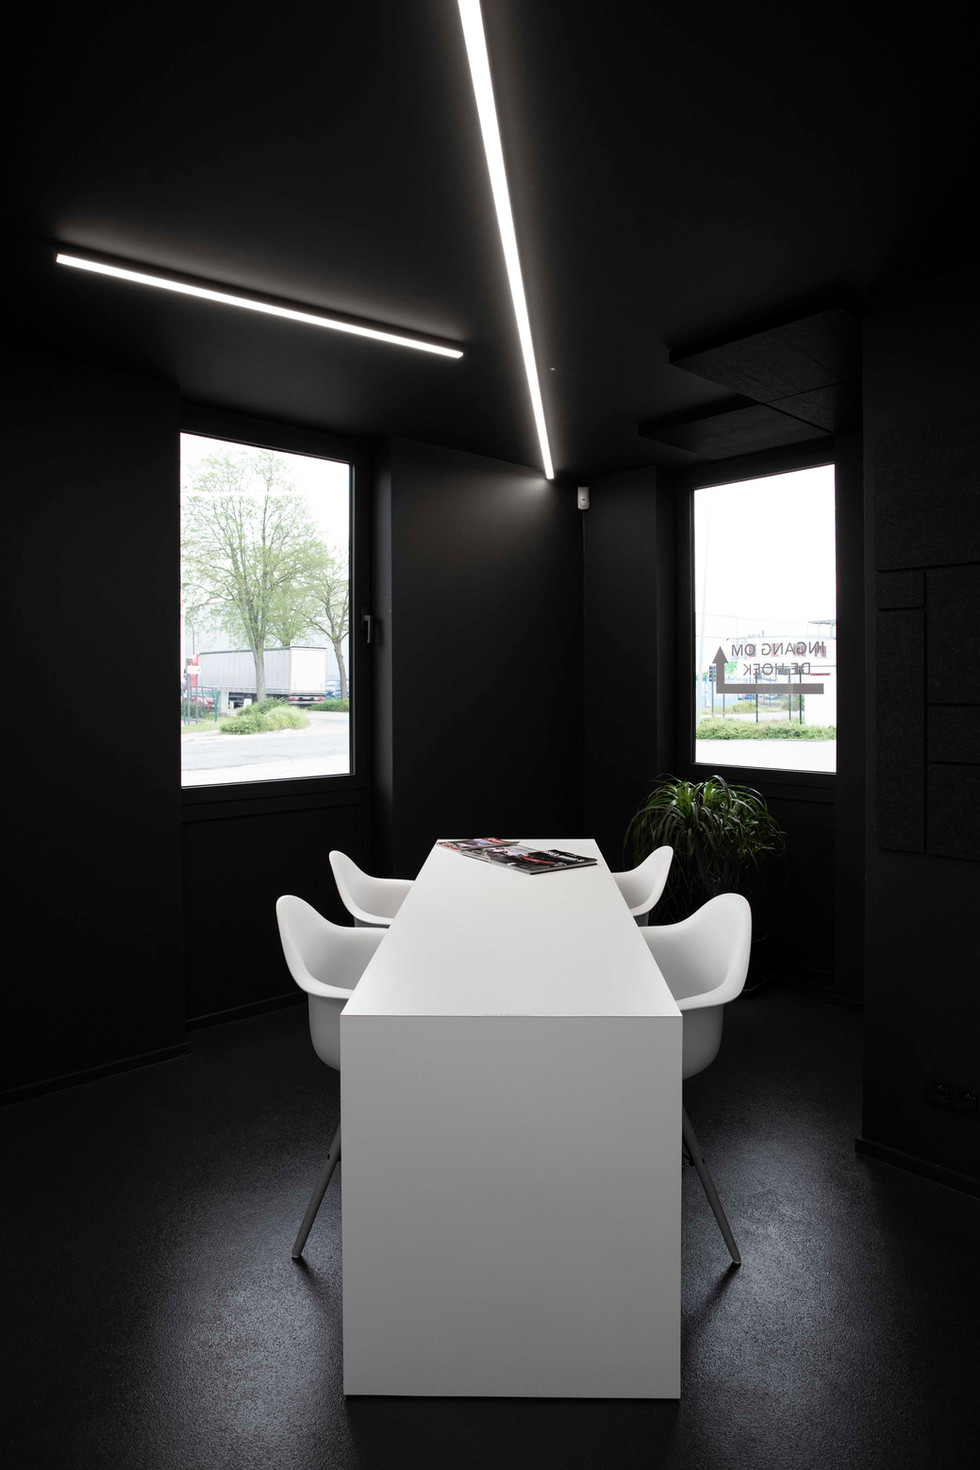 _MG_5094.architectuur fotografie - Sebastien Adriaensen - professioneel - tilt shift - drone -jpg